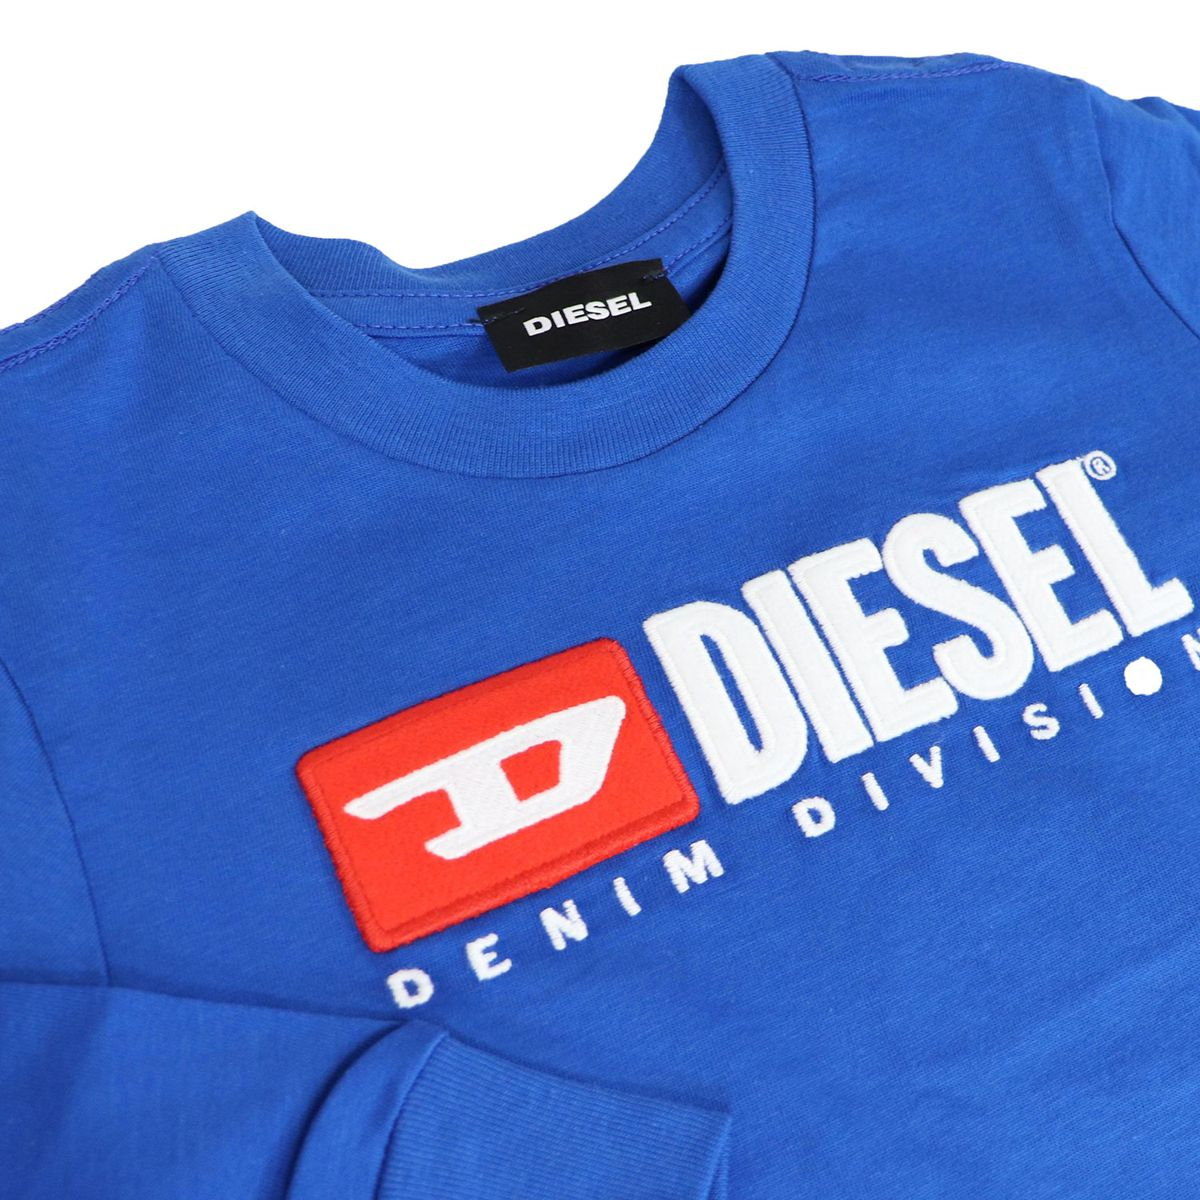 Long sleeve t-shirt with contrast logo Bluette Diesel